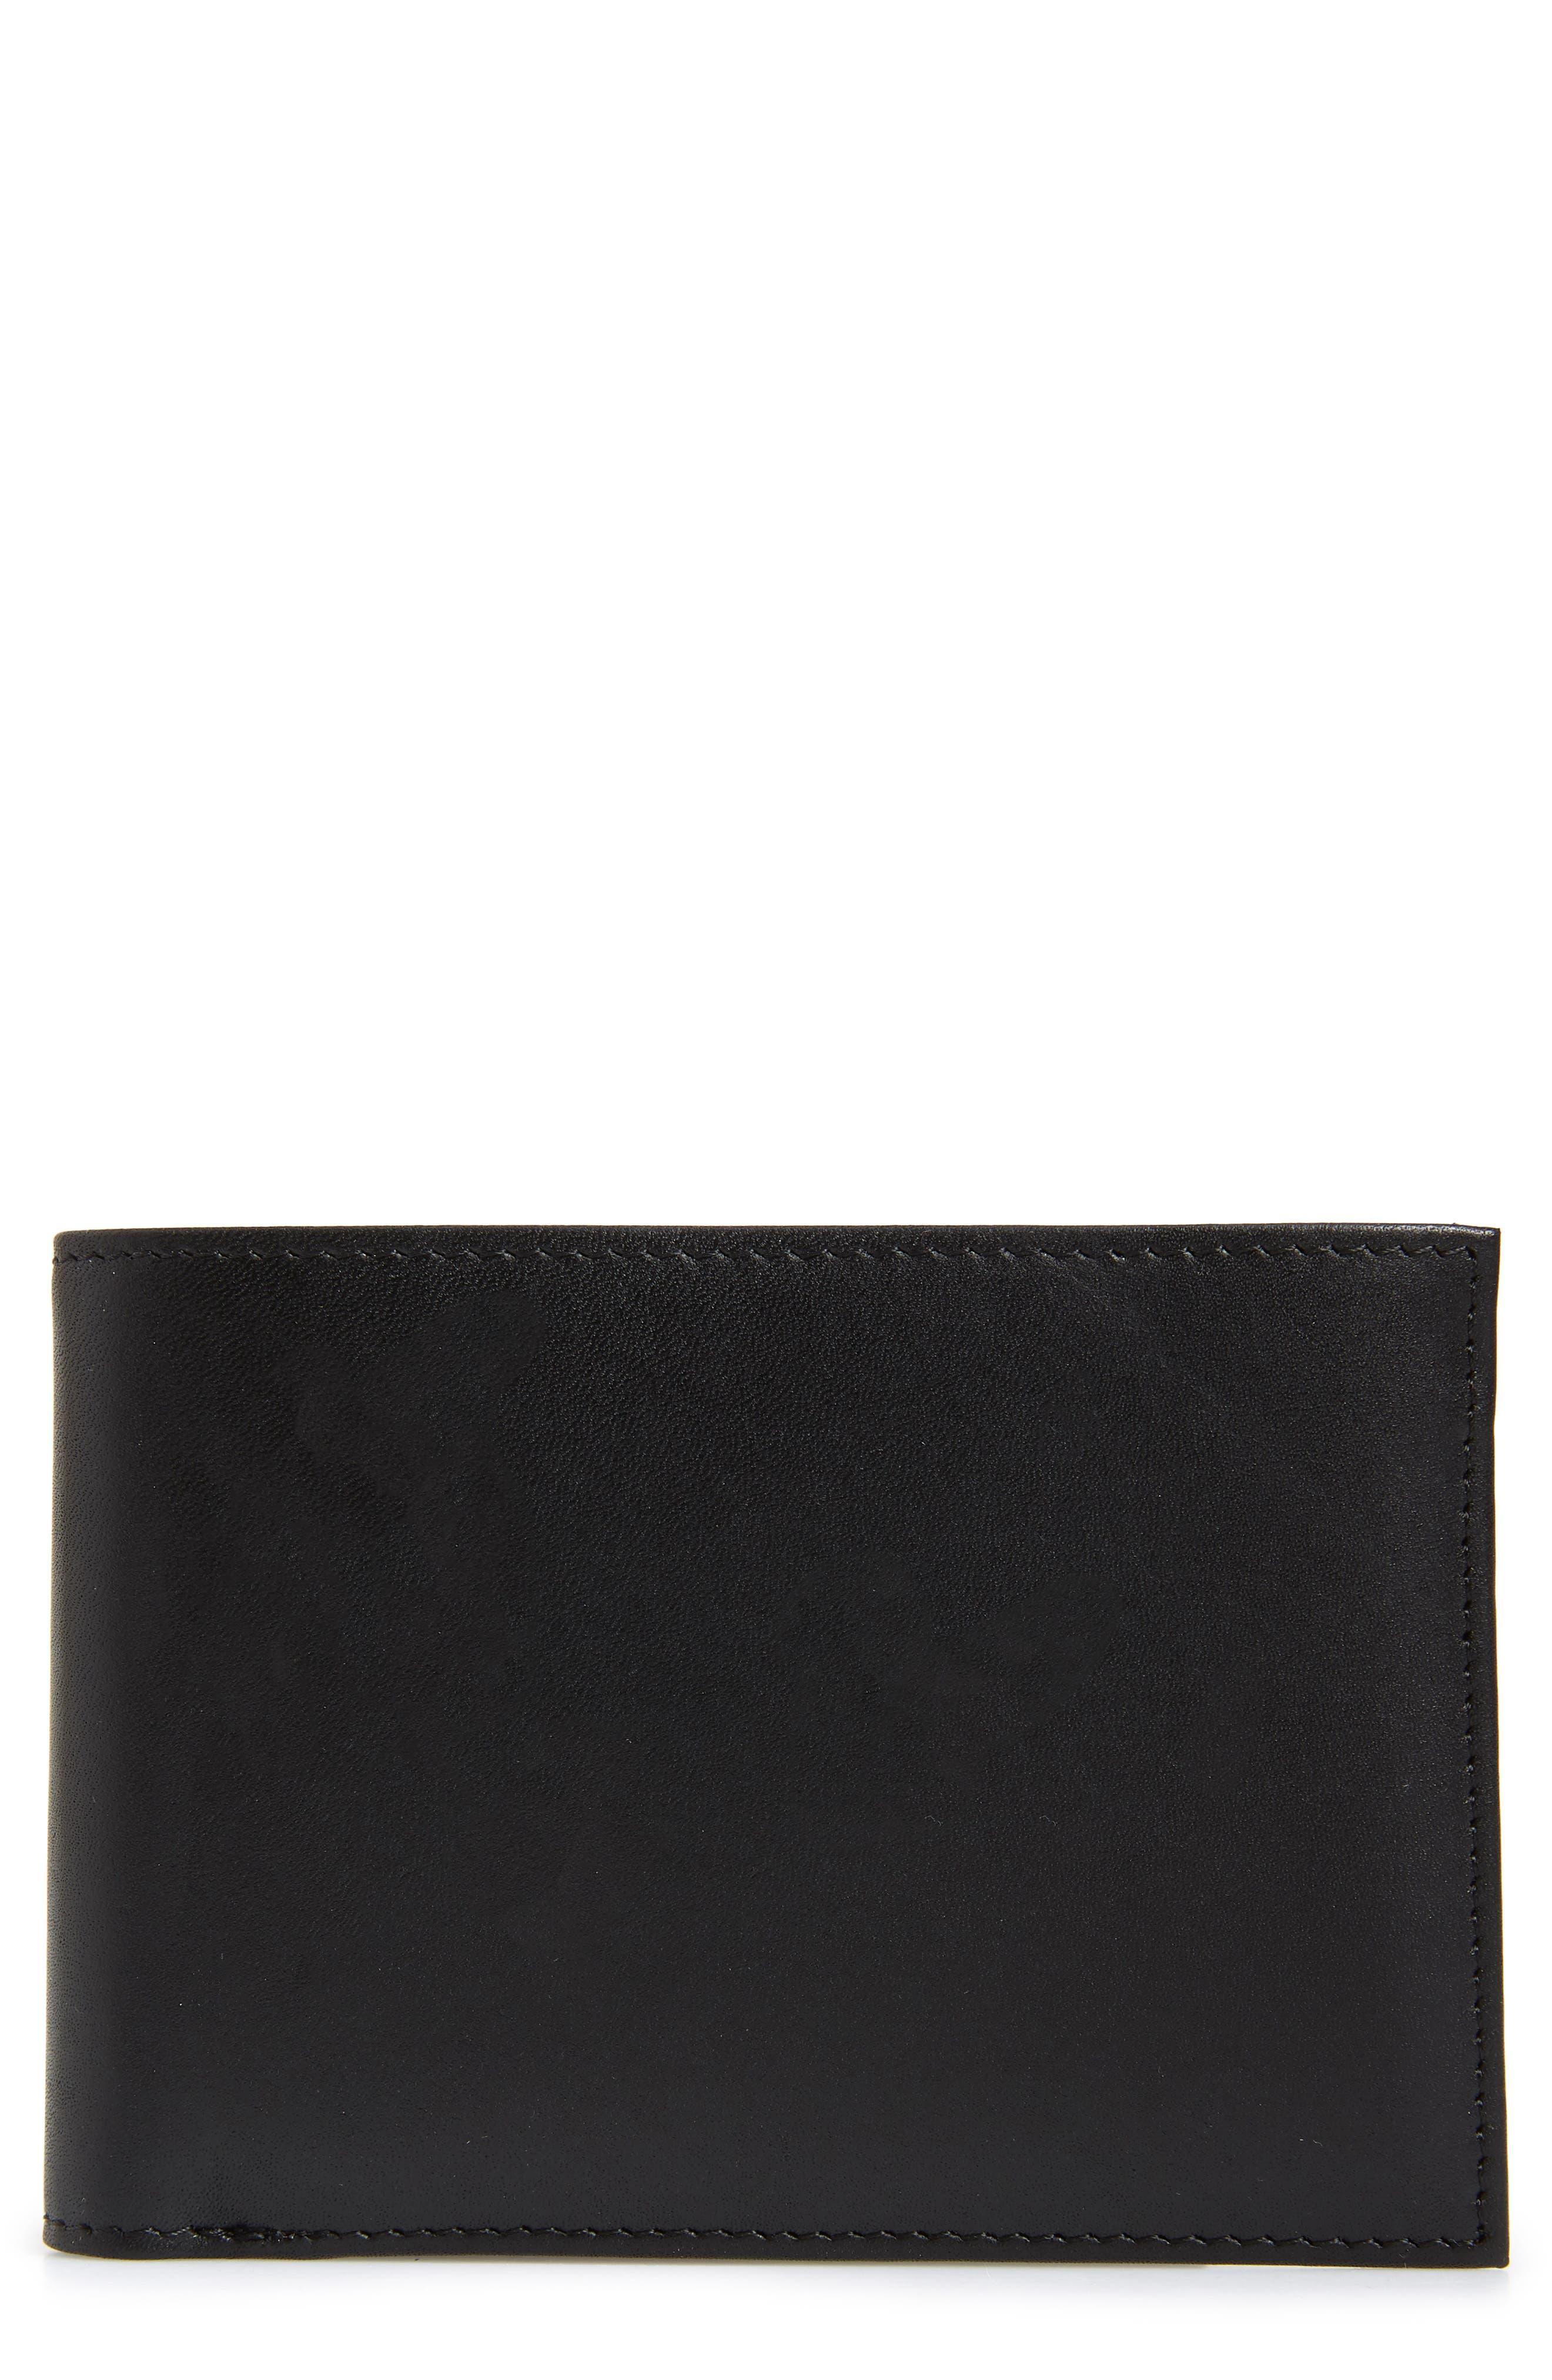 Chelsea Leather Wallet,                         Main,                         color, BLACK